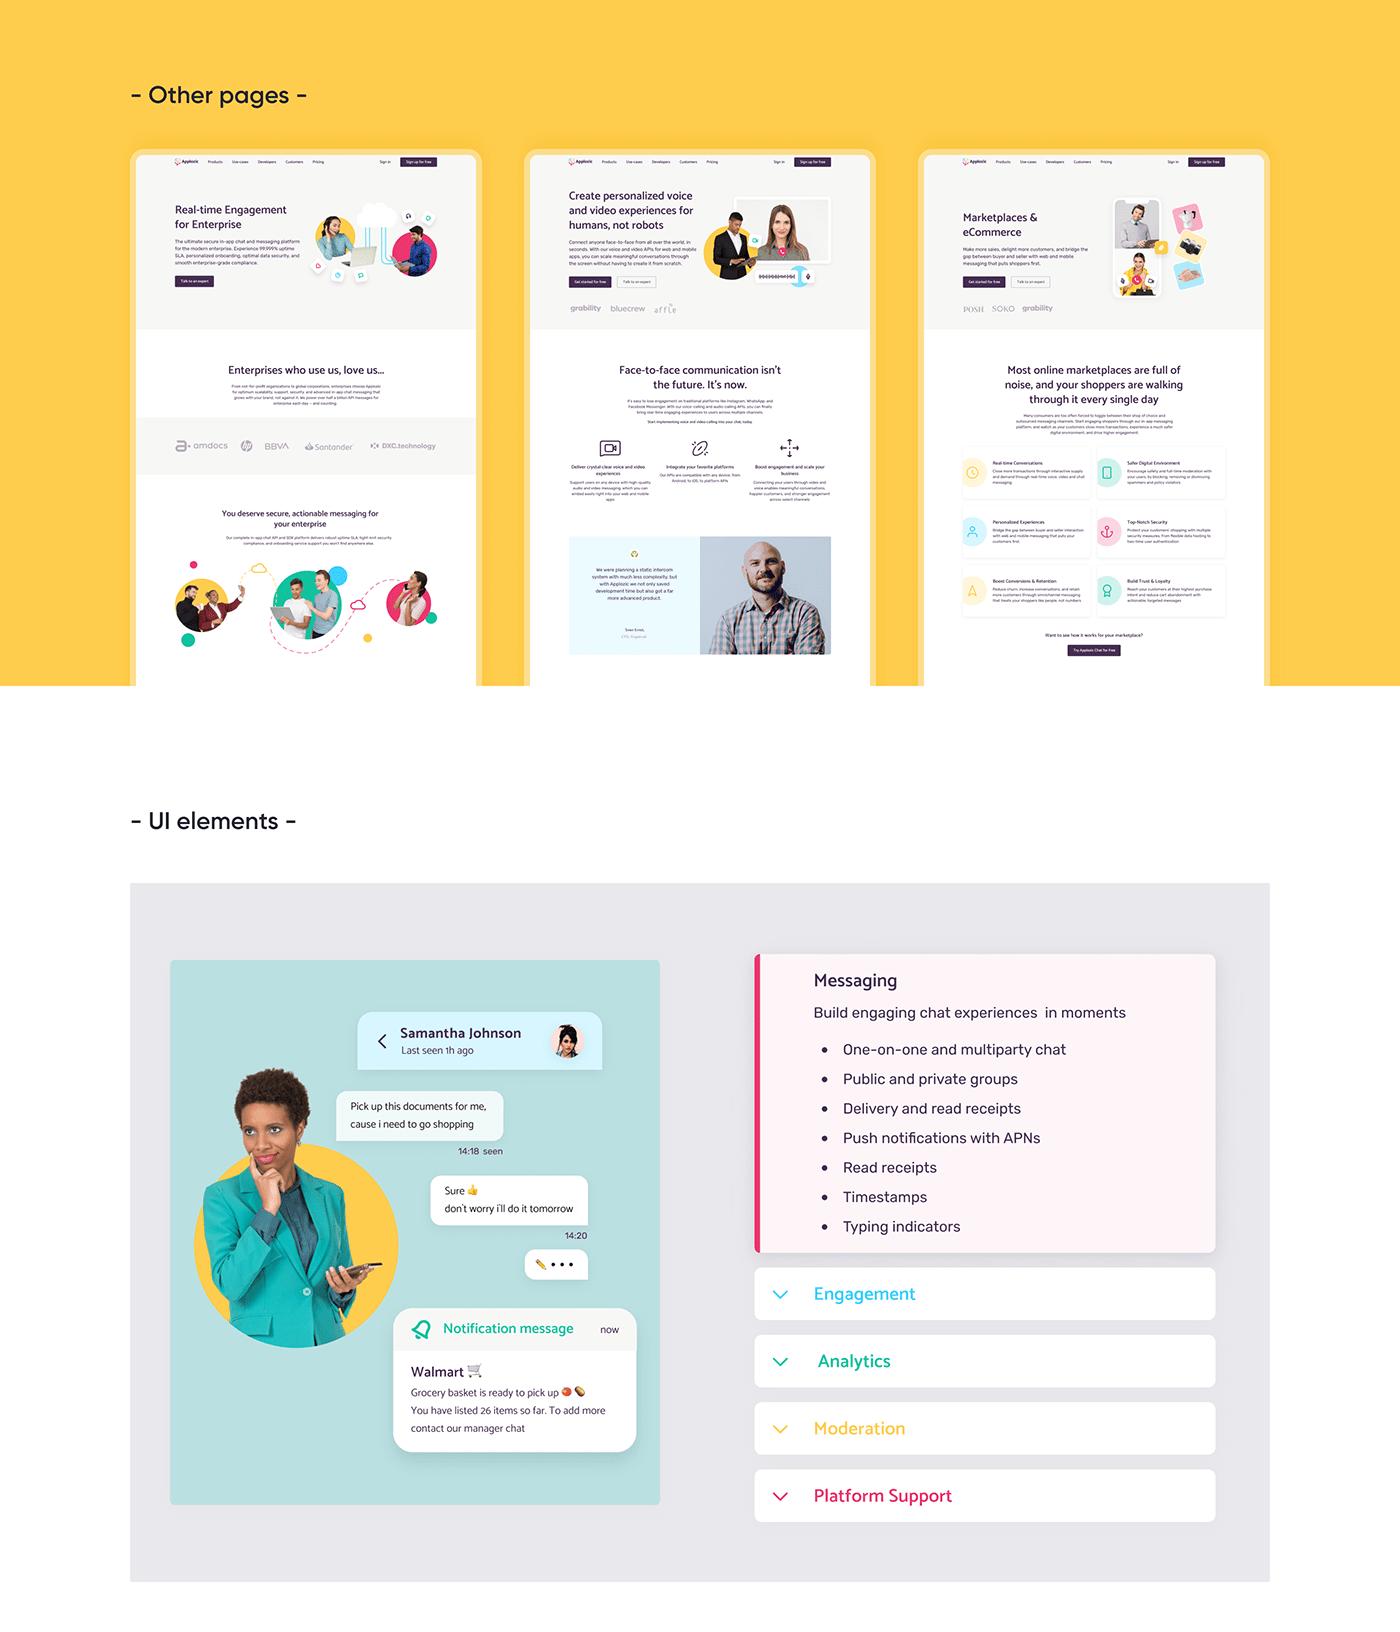 branding  experience design graphic design  landing page logo redesign ui design uiux visual design Webdesign